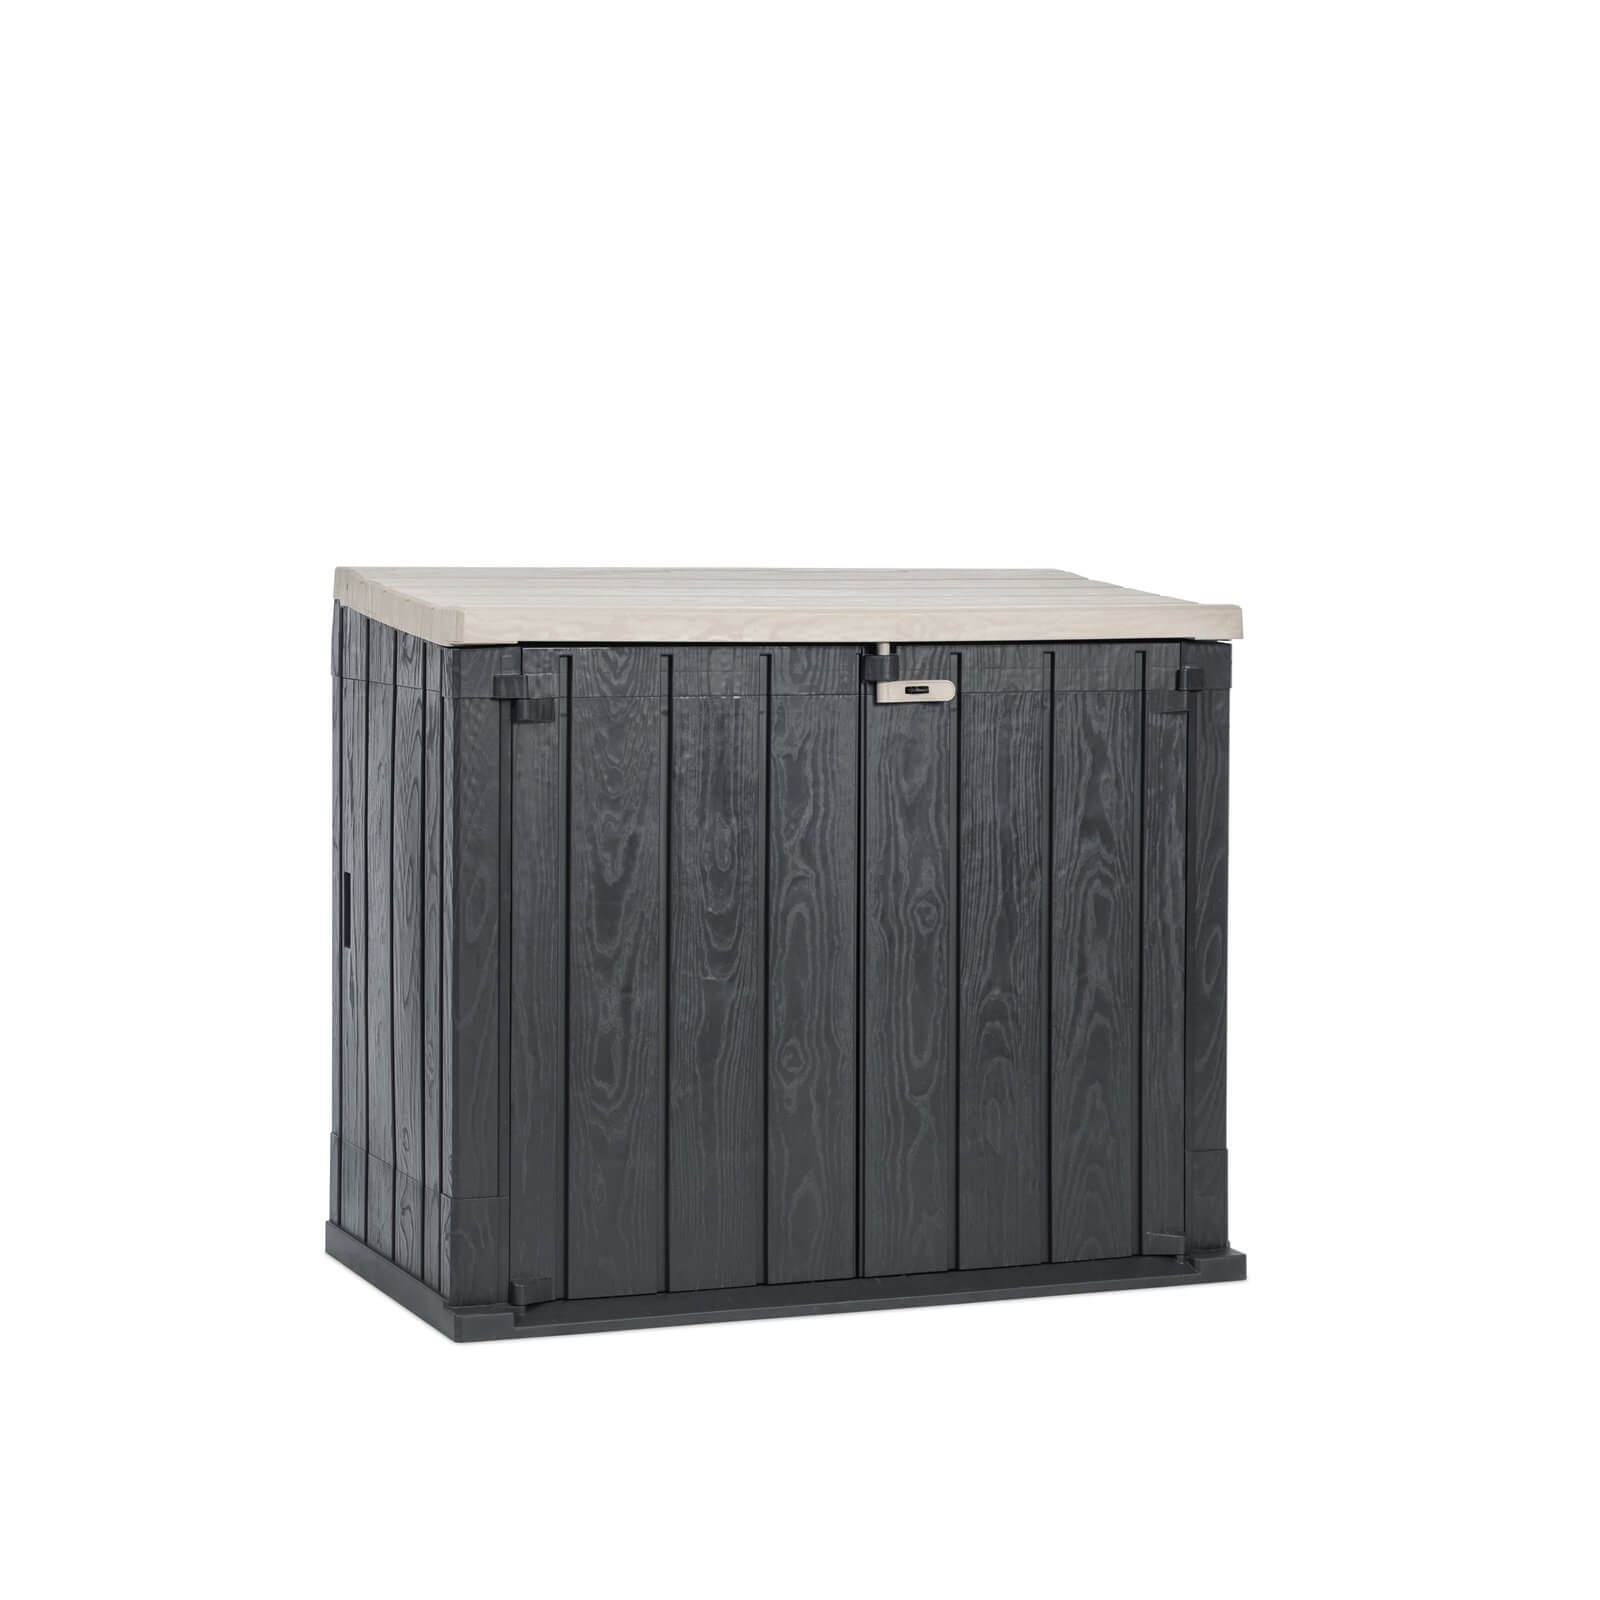 Toomax Stora Way XL 1270L Garden Storage Box in Warm Grey